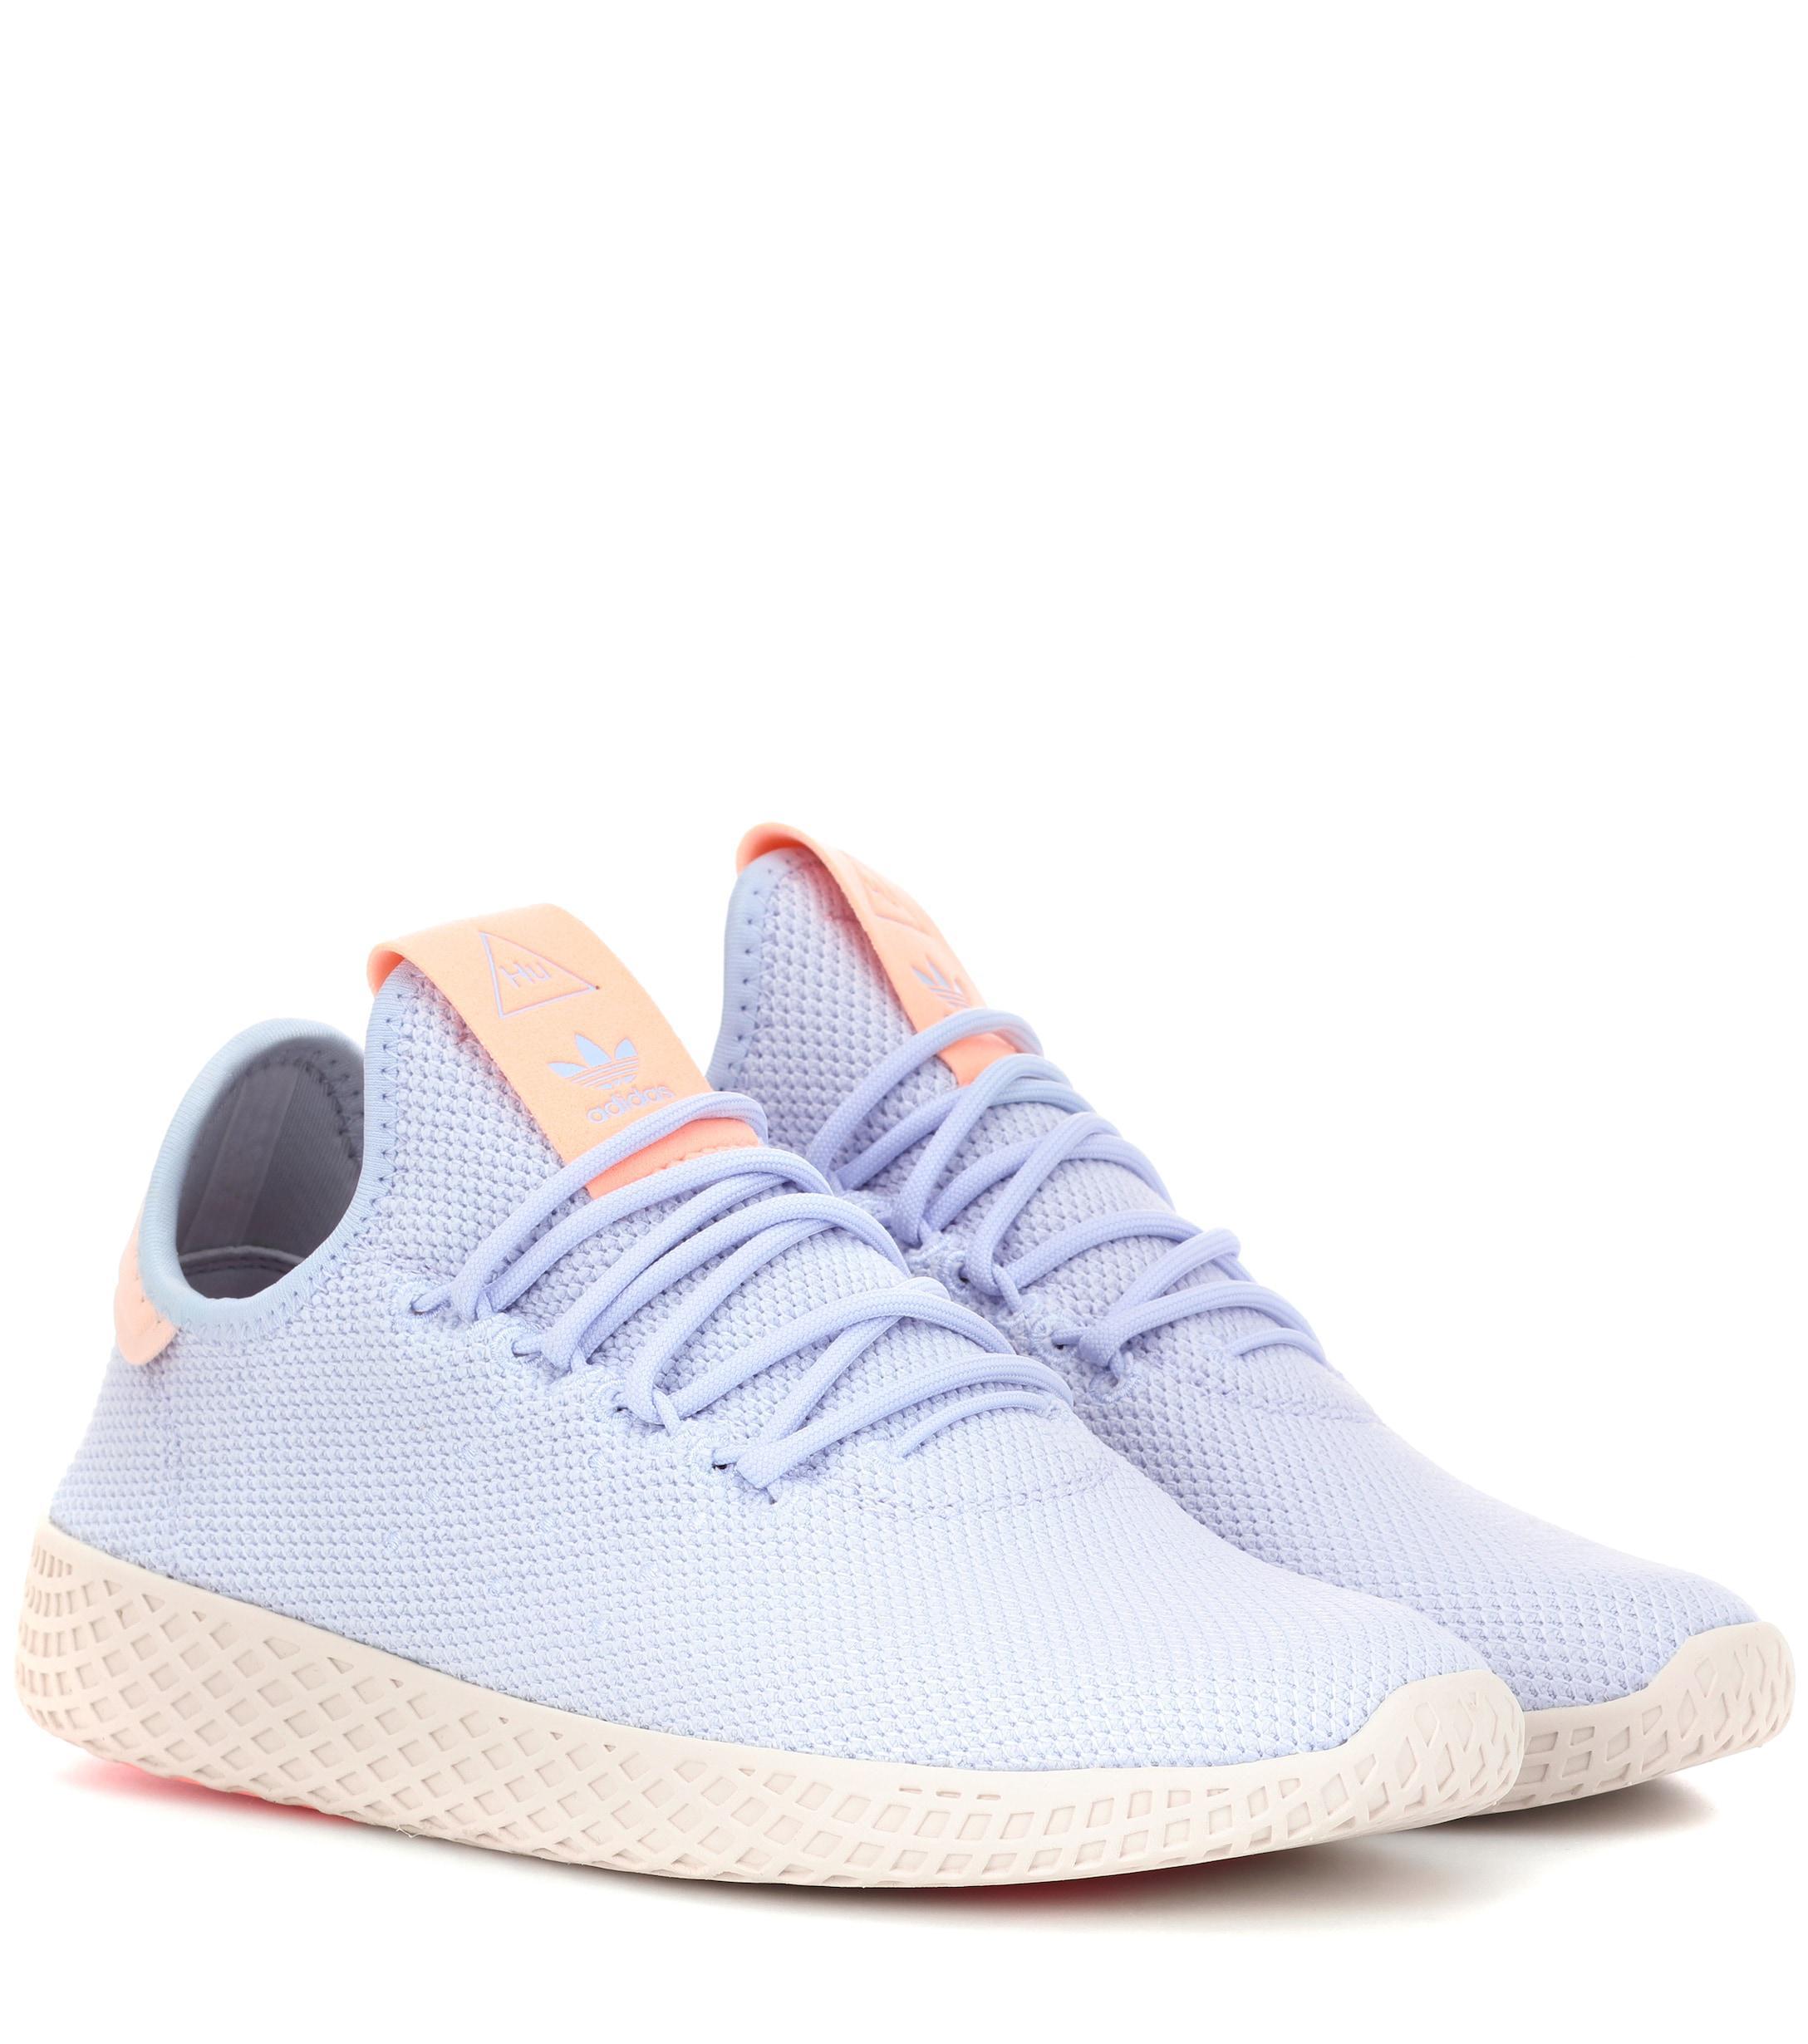 a58a241ef Adidas Originals Pharrell Williams Tennis Hu Sneakers in Blue - Lyst